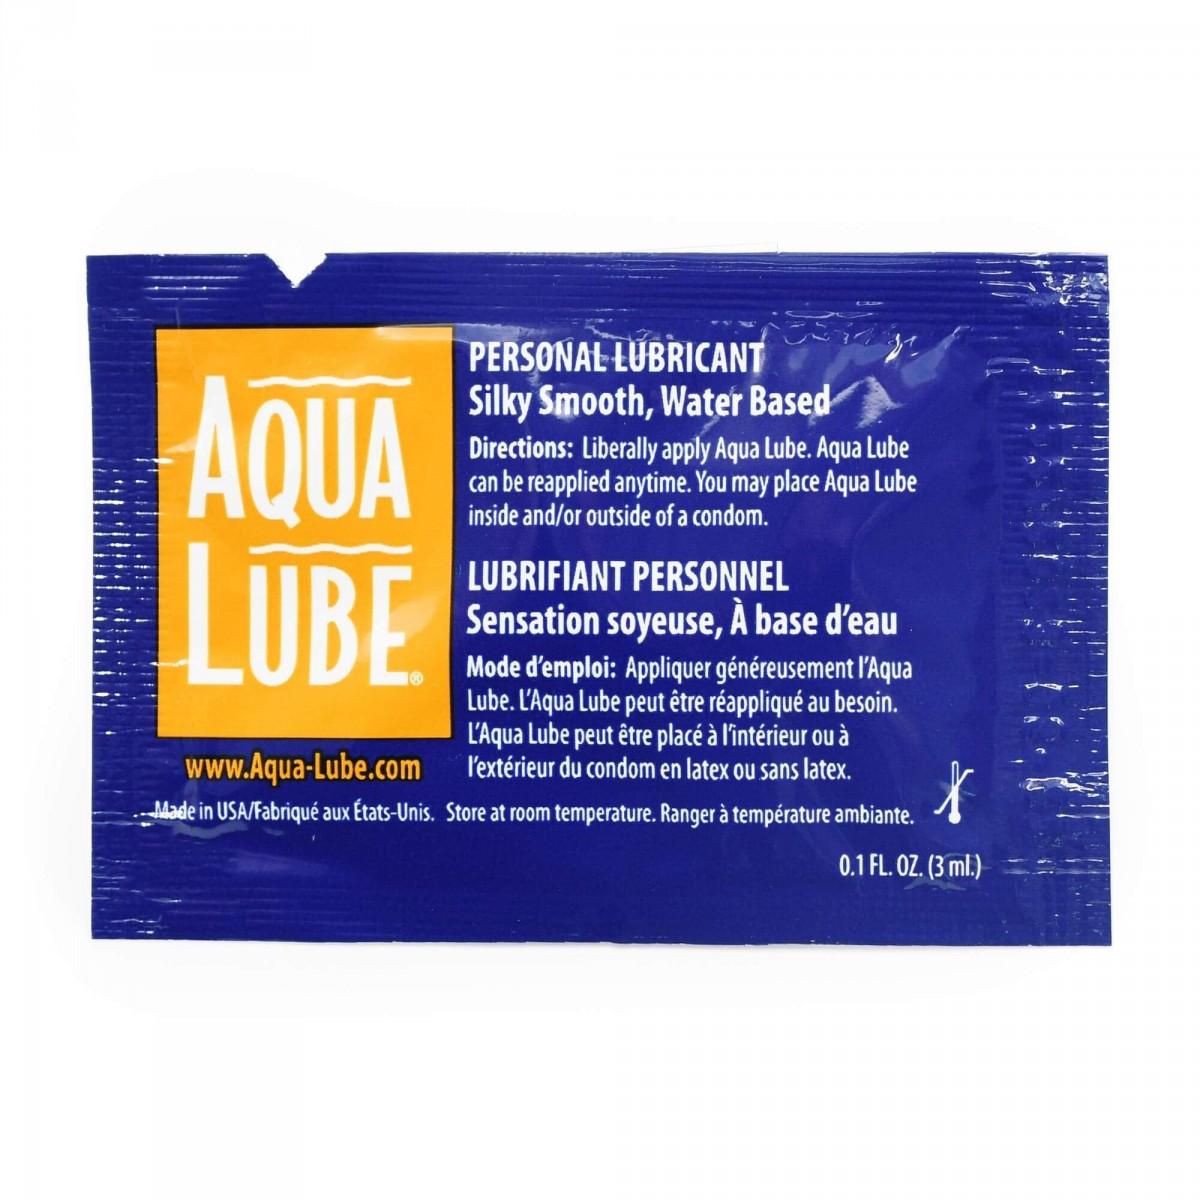 Aqualube Lubricant 3 ml